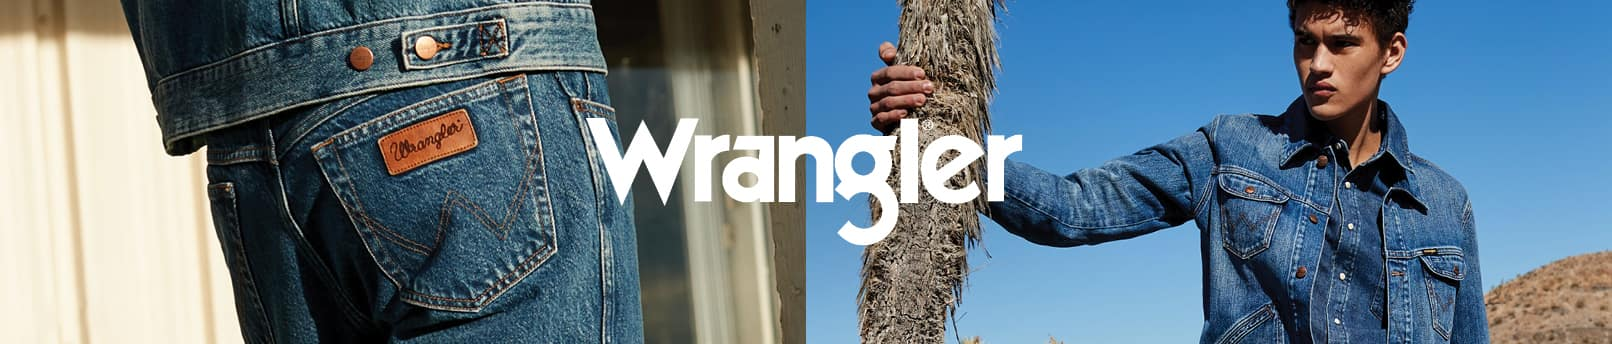 Shop Wrangler